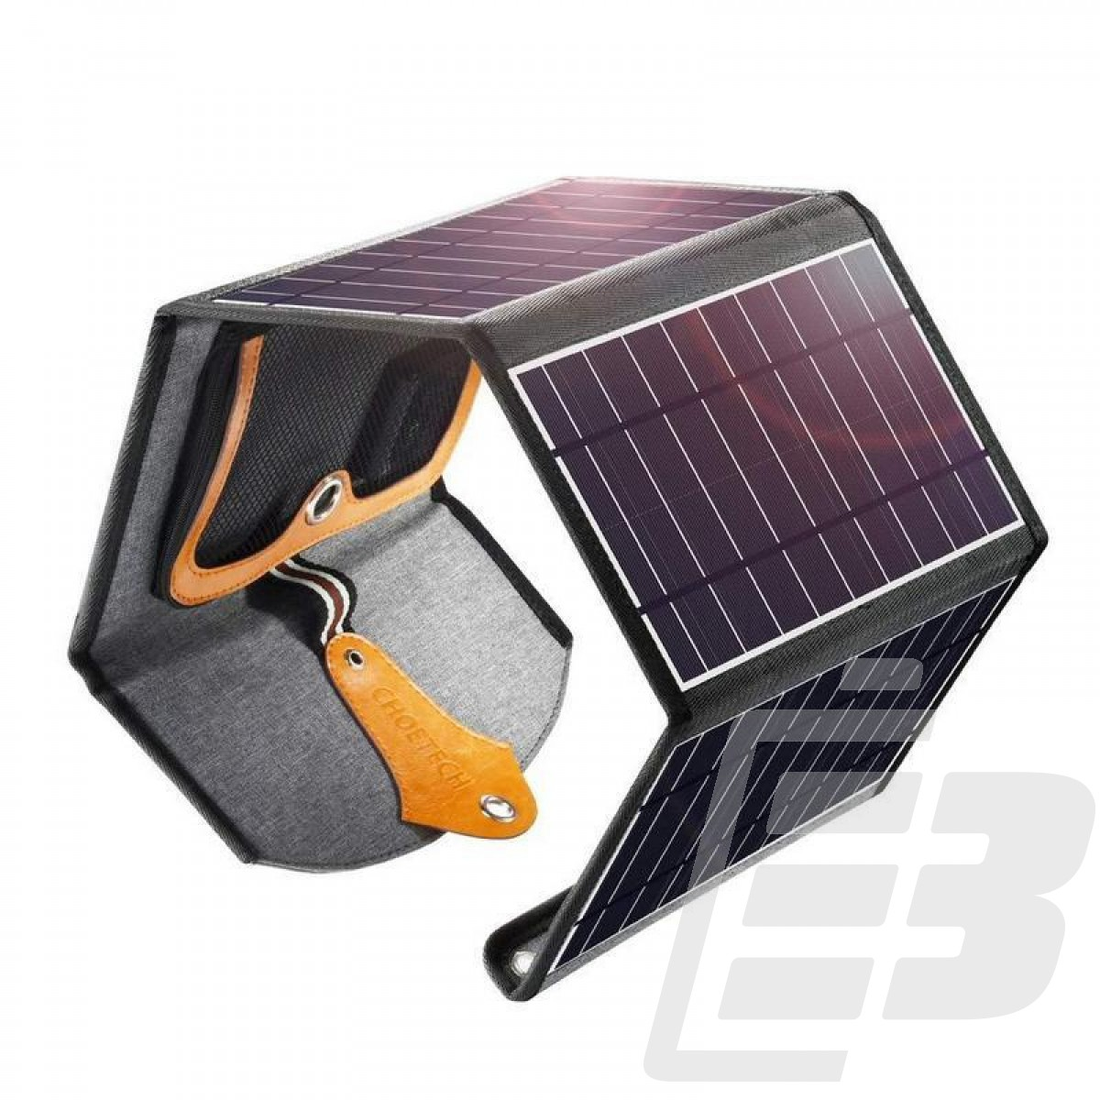 Choetech SC005 Waterproof Solar Charger 2 x USB 4 x Panels 22W